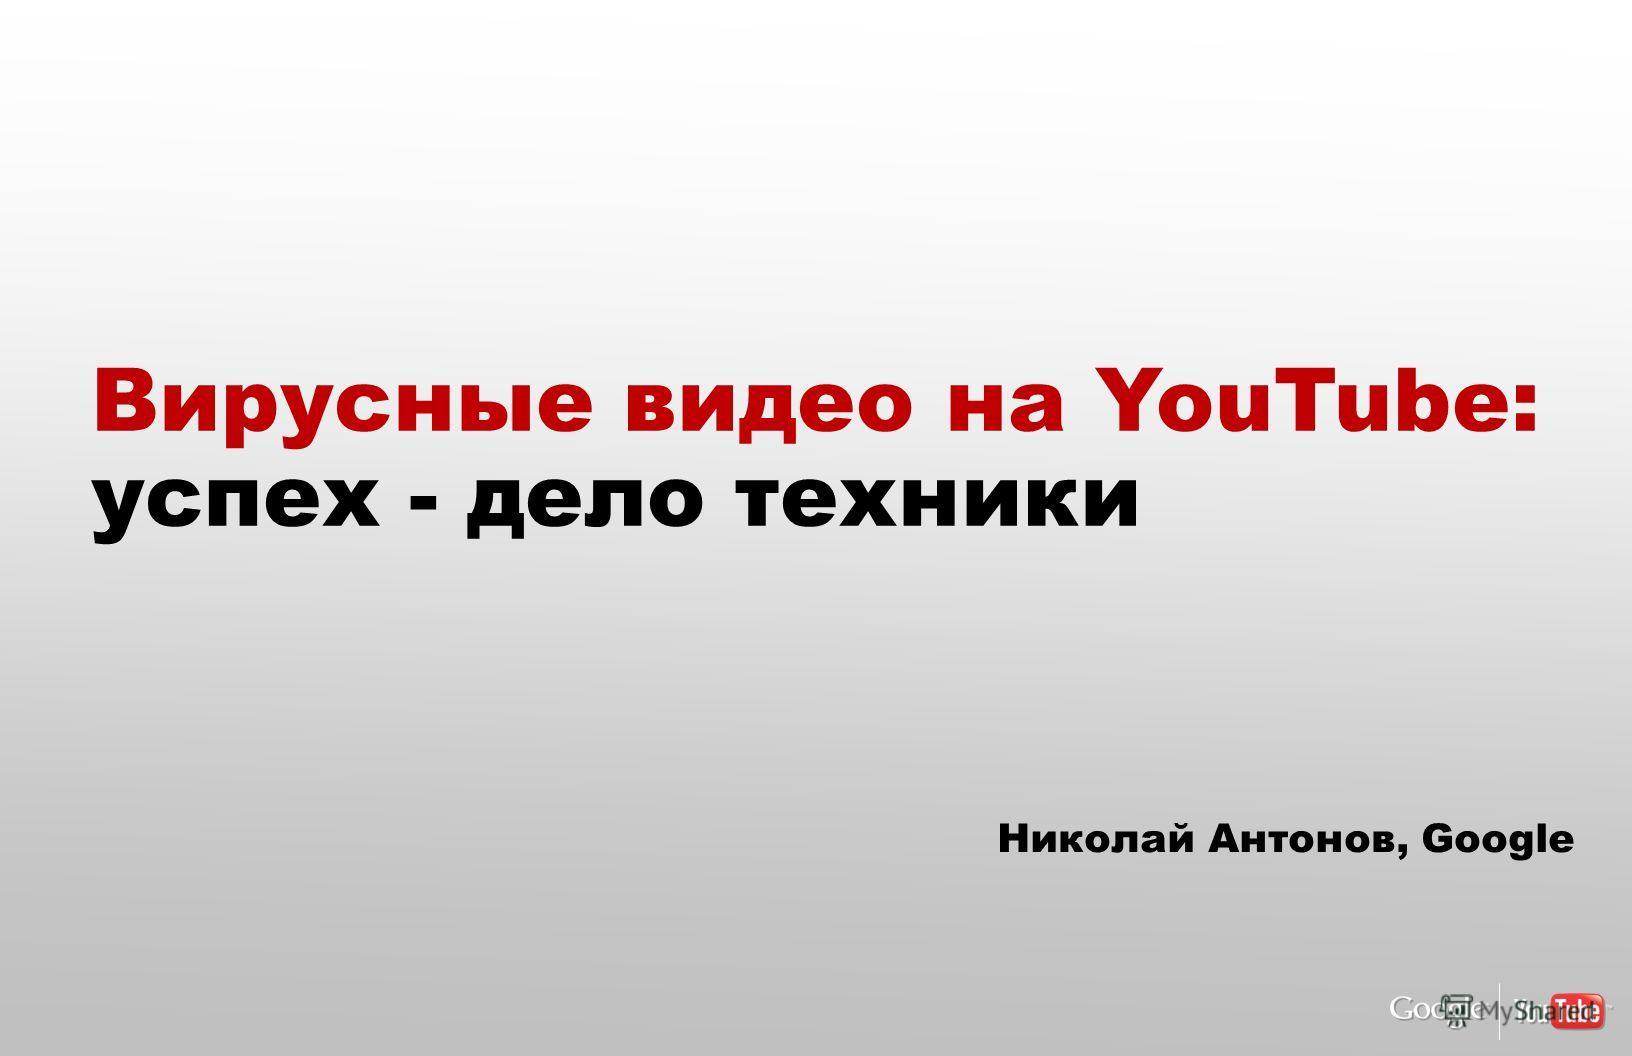 so why did I come to google | youtube? Вирусные видео на YouTube: успех - дело техники Николай Антонов, Google